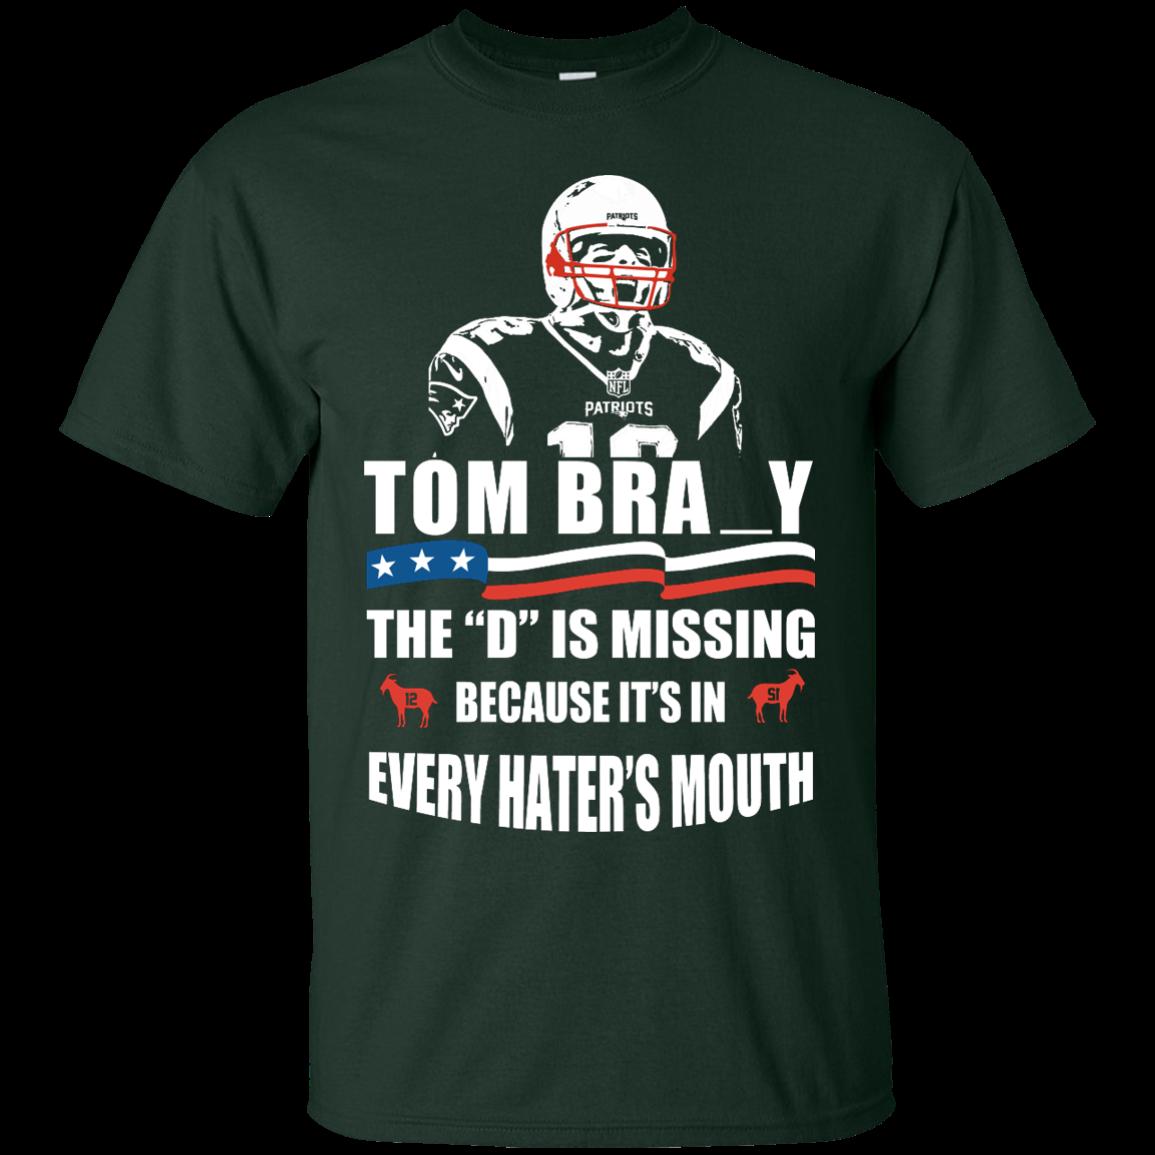 Tom Brady The D Is Missing T-Shirt, Hoodies, Tank